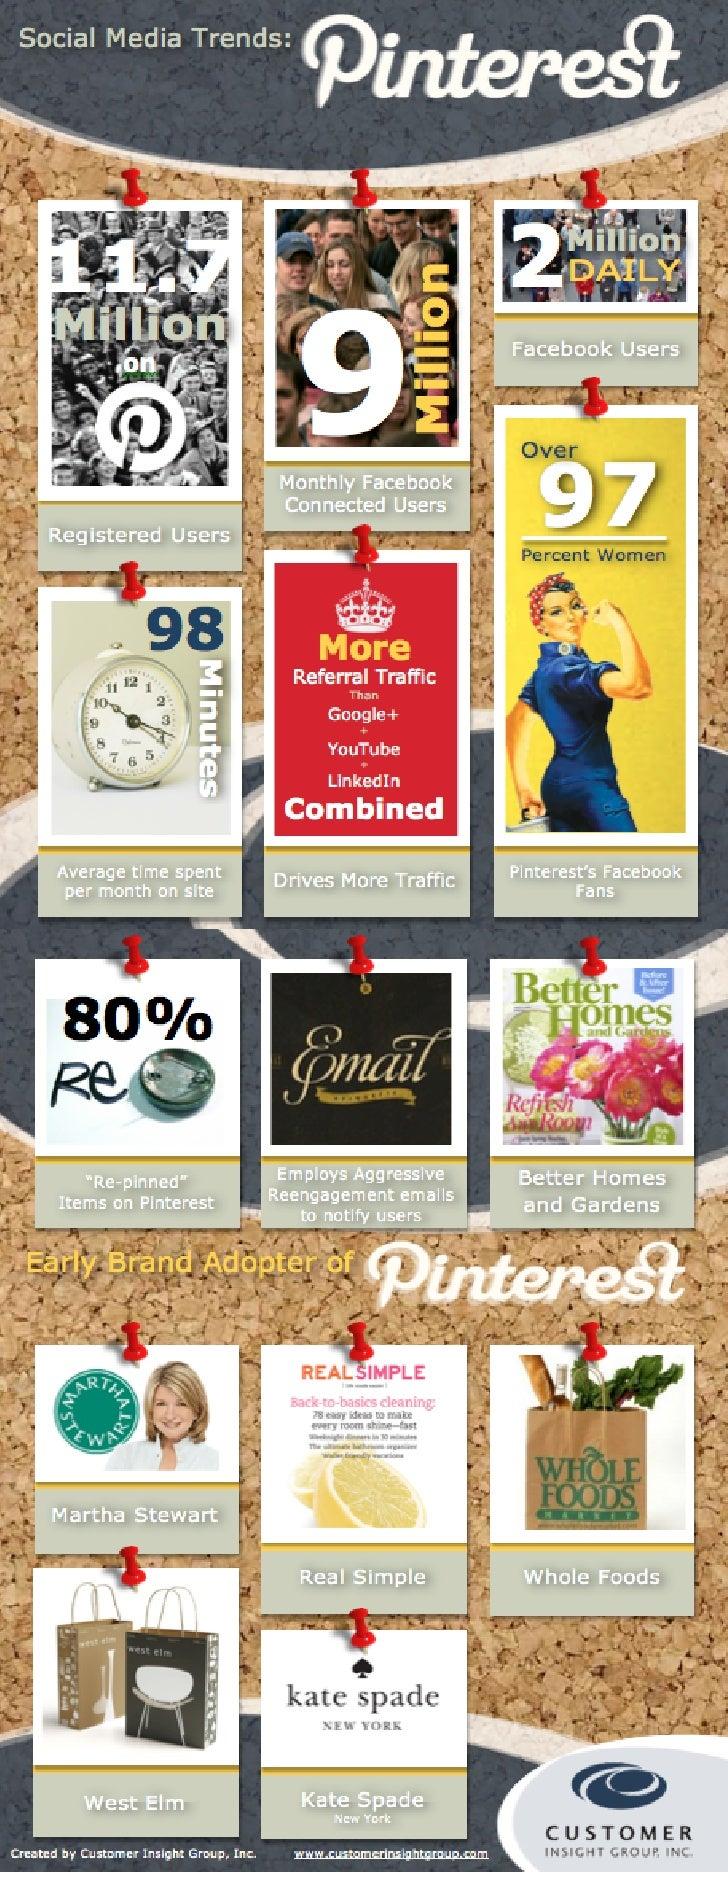 Pinterest a New Brand Bulding Tool